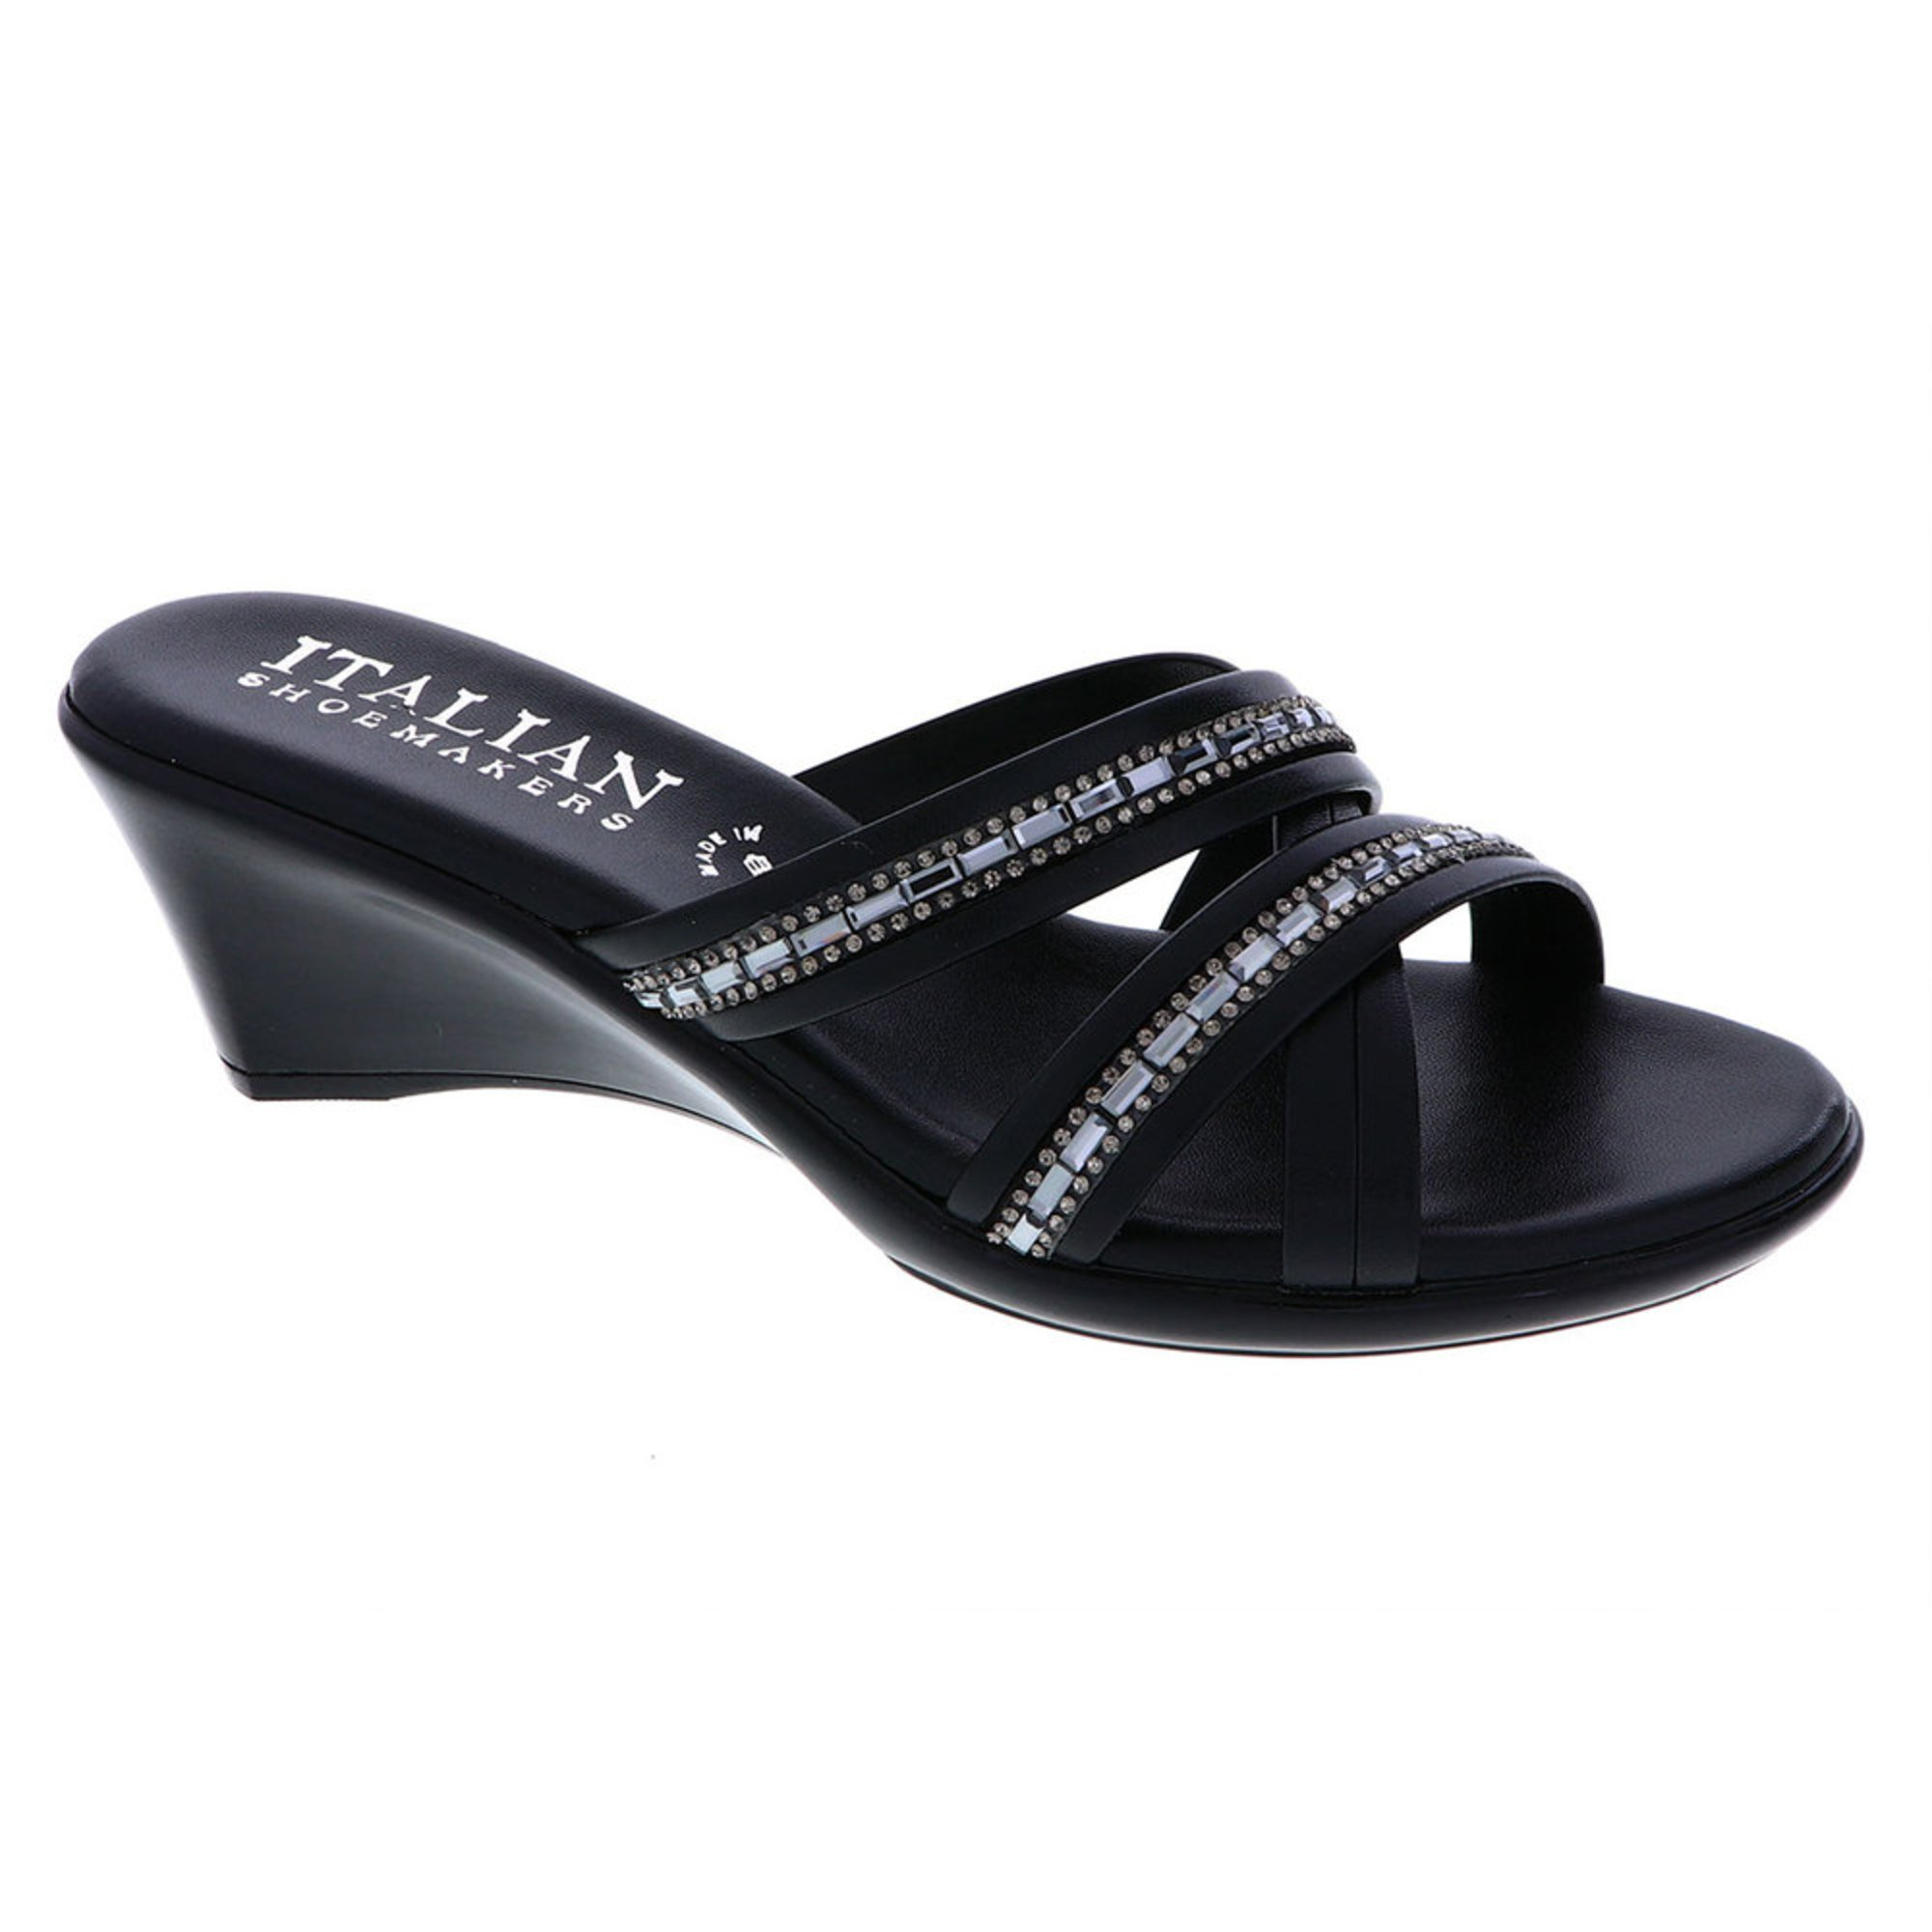 f5d761a04755 Italian Shoemakers. Italian Shoemakers Women s Passion Asymmetrical Rhinestone  Sandal